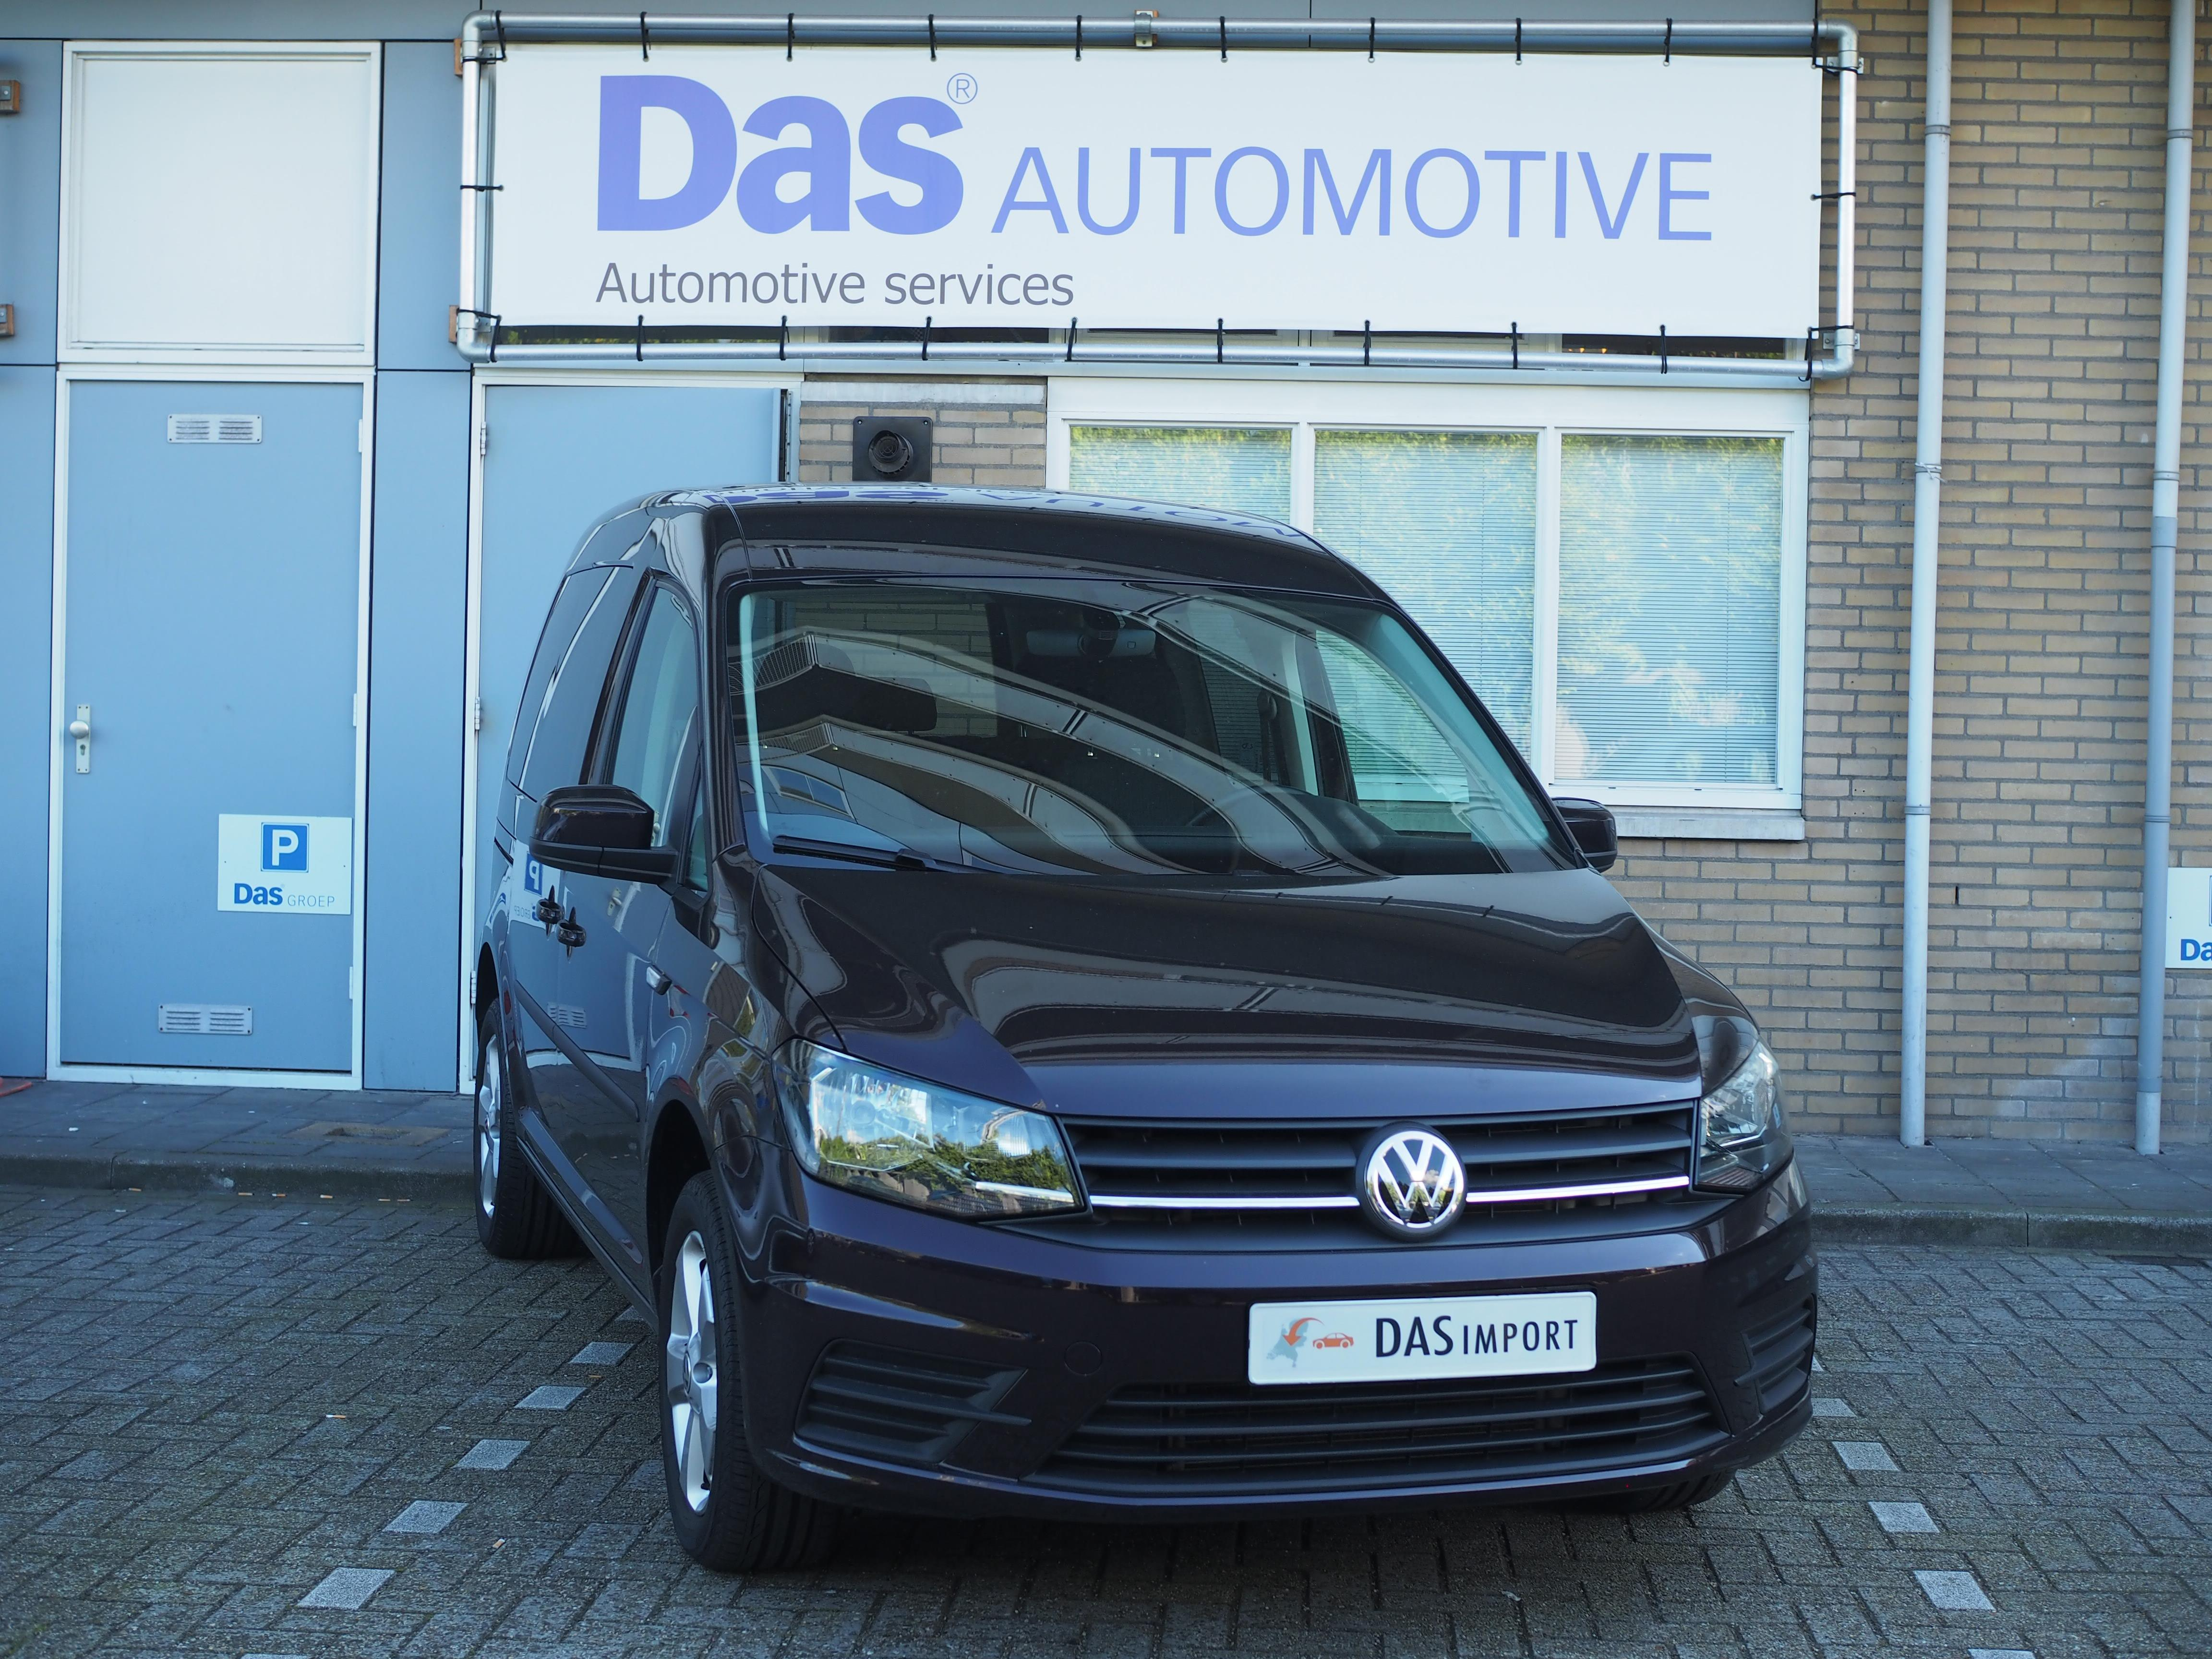 Importauto: Volkswagen Caddy Combi 1.4 TSI 125pk Trendline DSG 9/2015